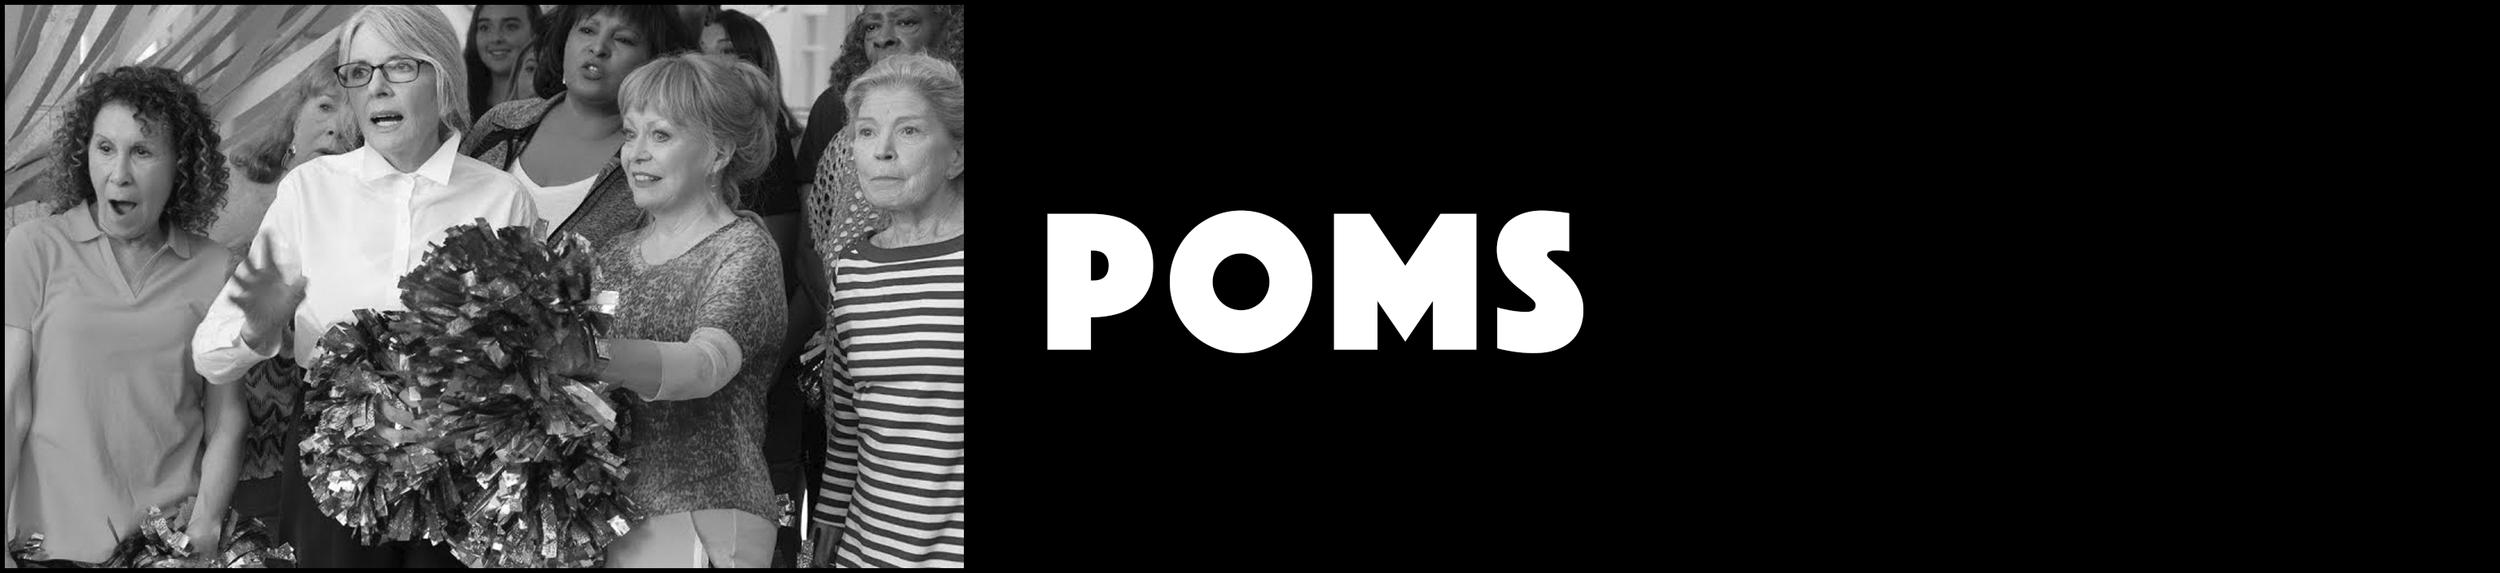 Poms.png